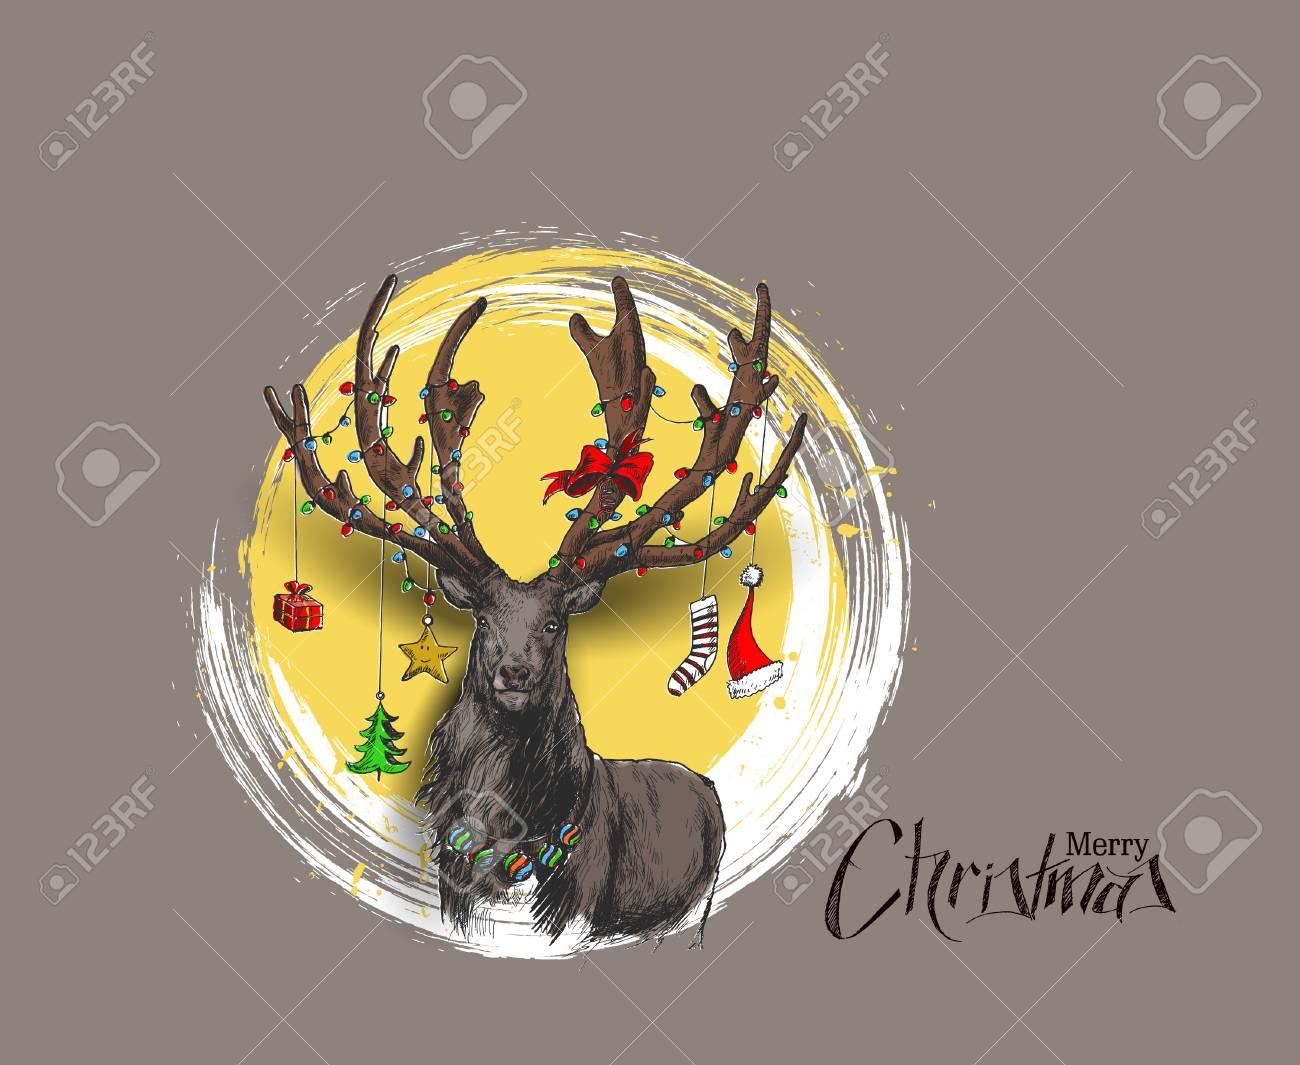 Happy Christmas , Cartoon Style Hand Sketchy drawing of reindeer,..